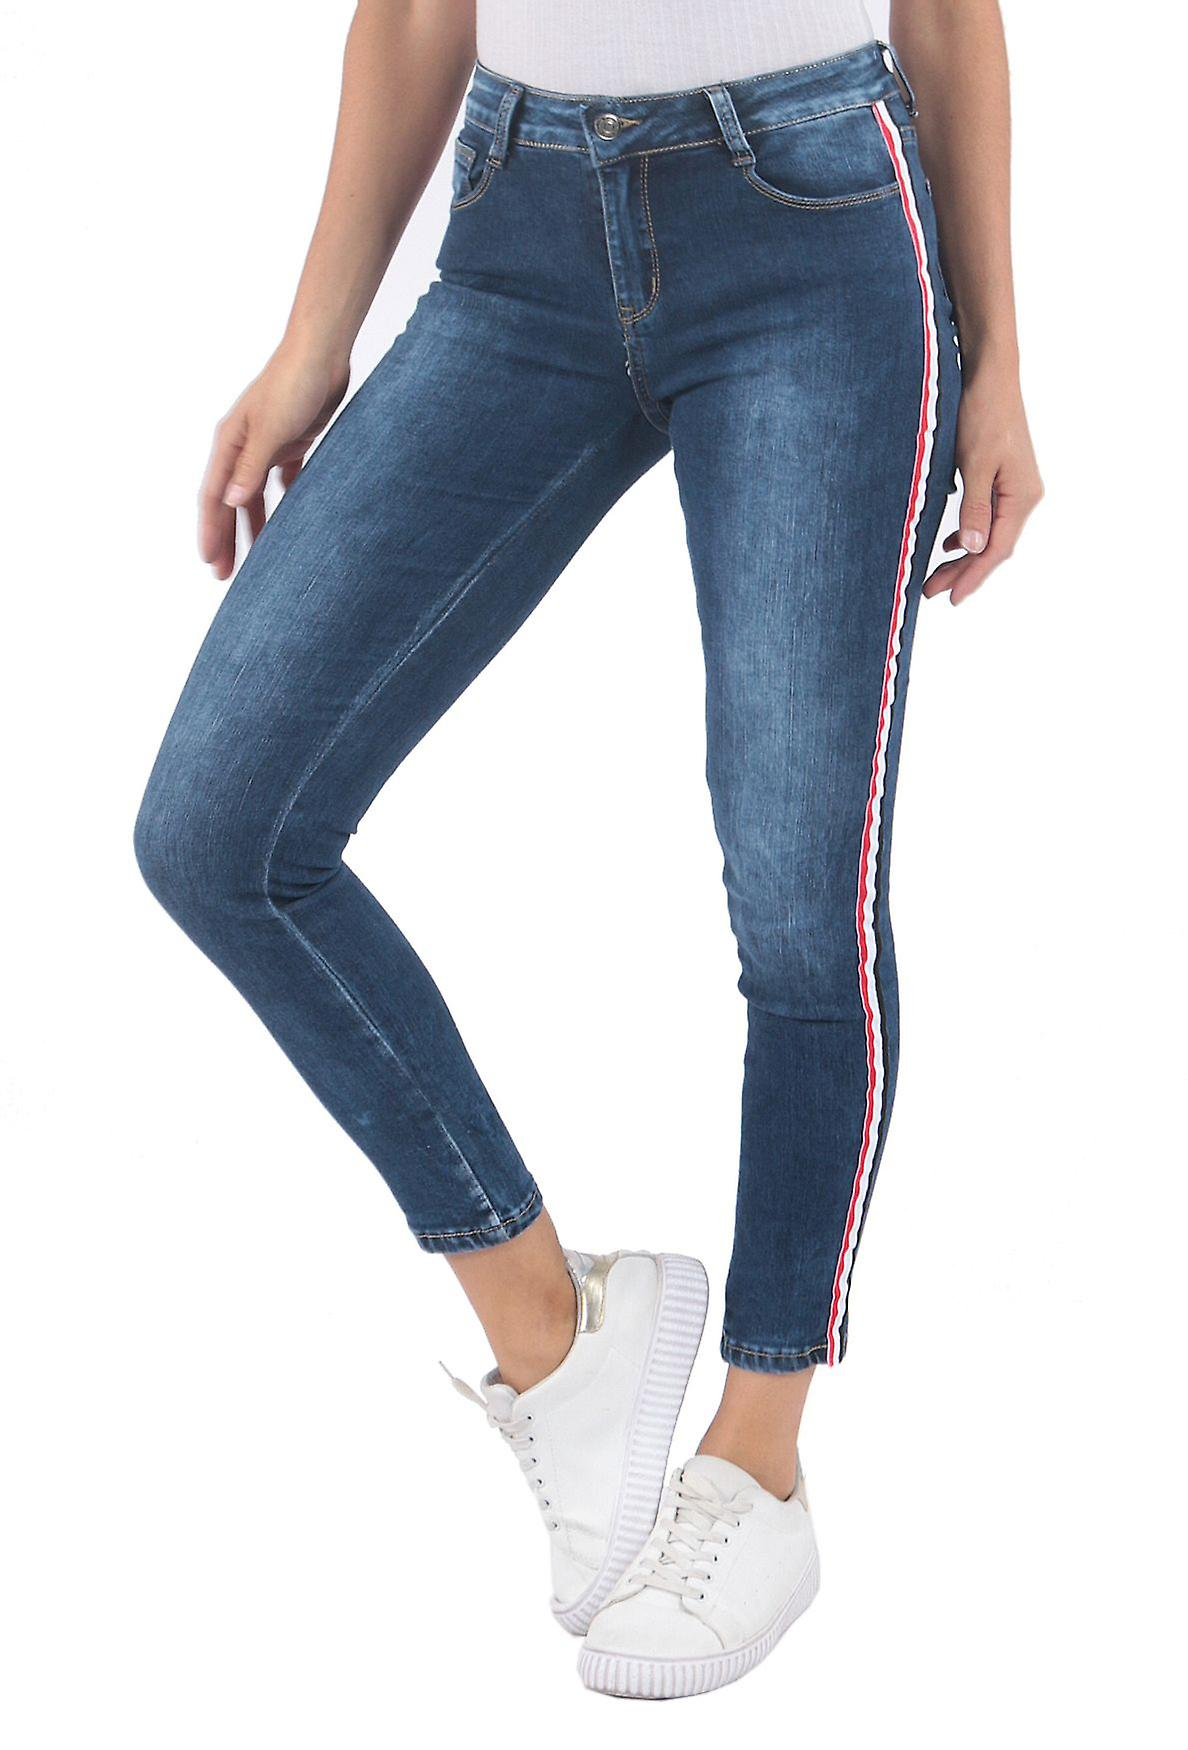 Ladies Jeans Stripes Pants Skinny Tube Jeans Contrast Stripes Denim Trackpants